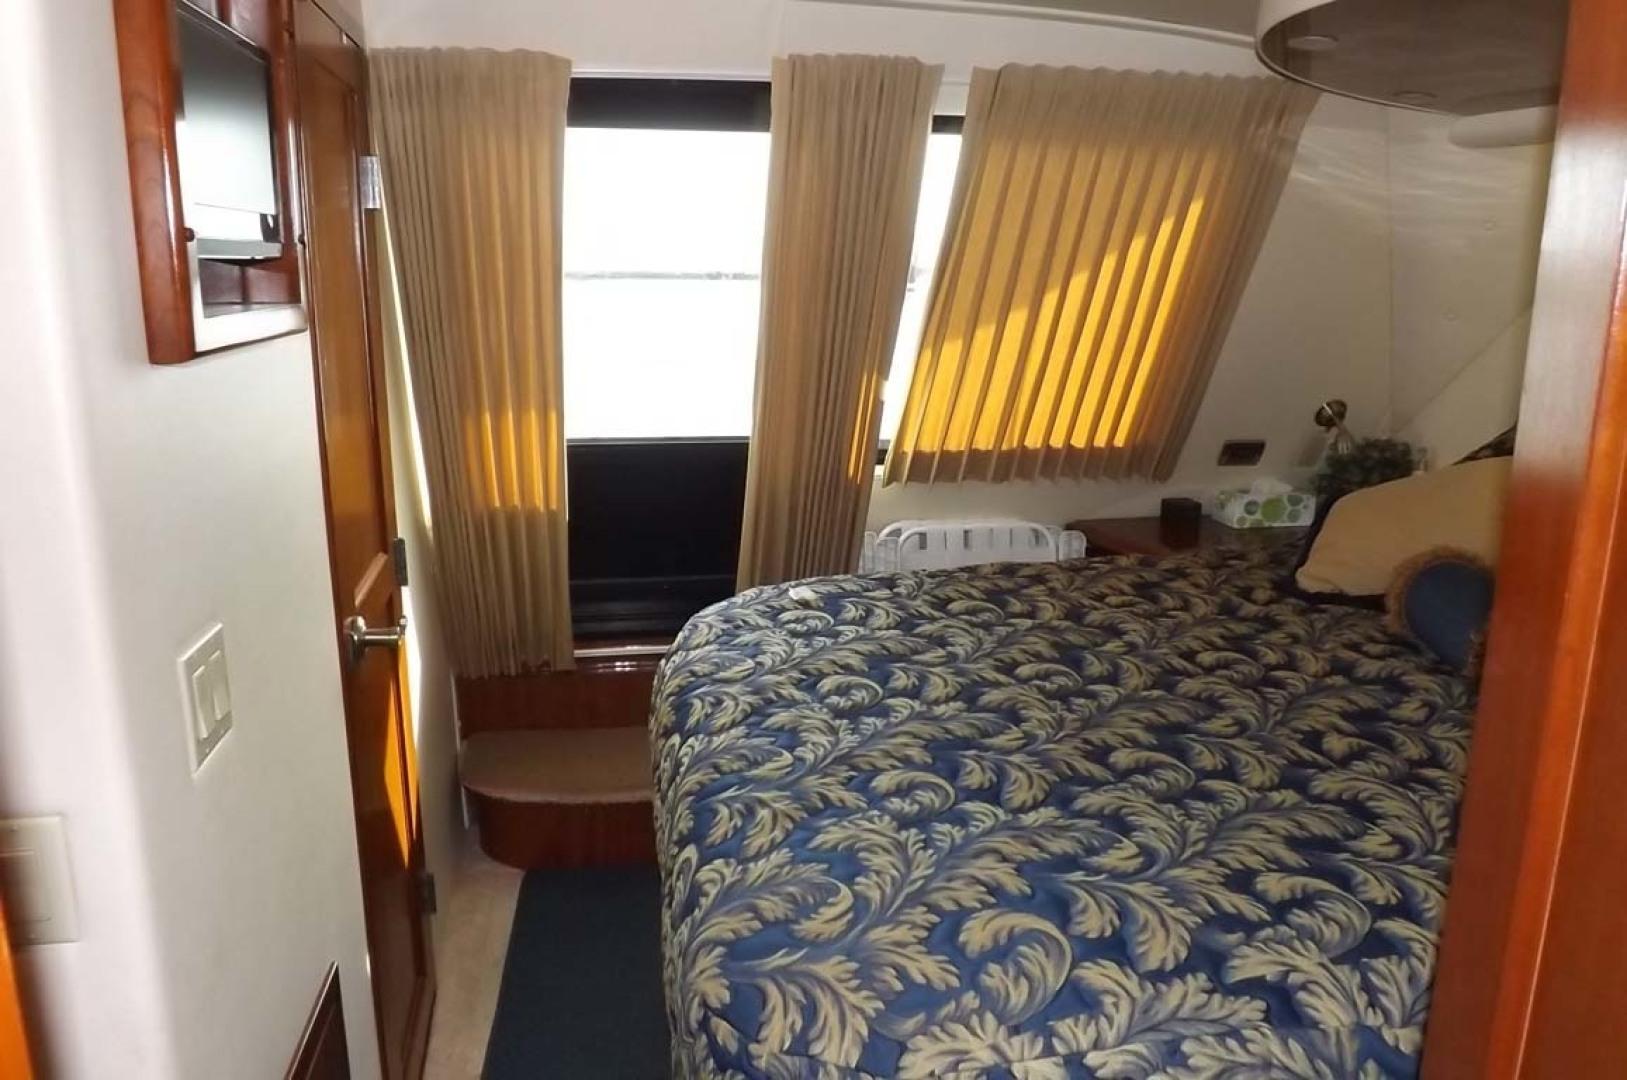 Bluewater Yachts-5200 2006 -Mount Pleasant-South Carolina-United States-Master Stateroom-1412943 | Thumbnail